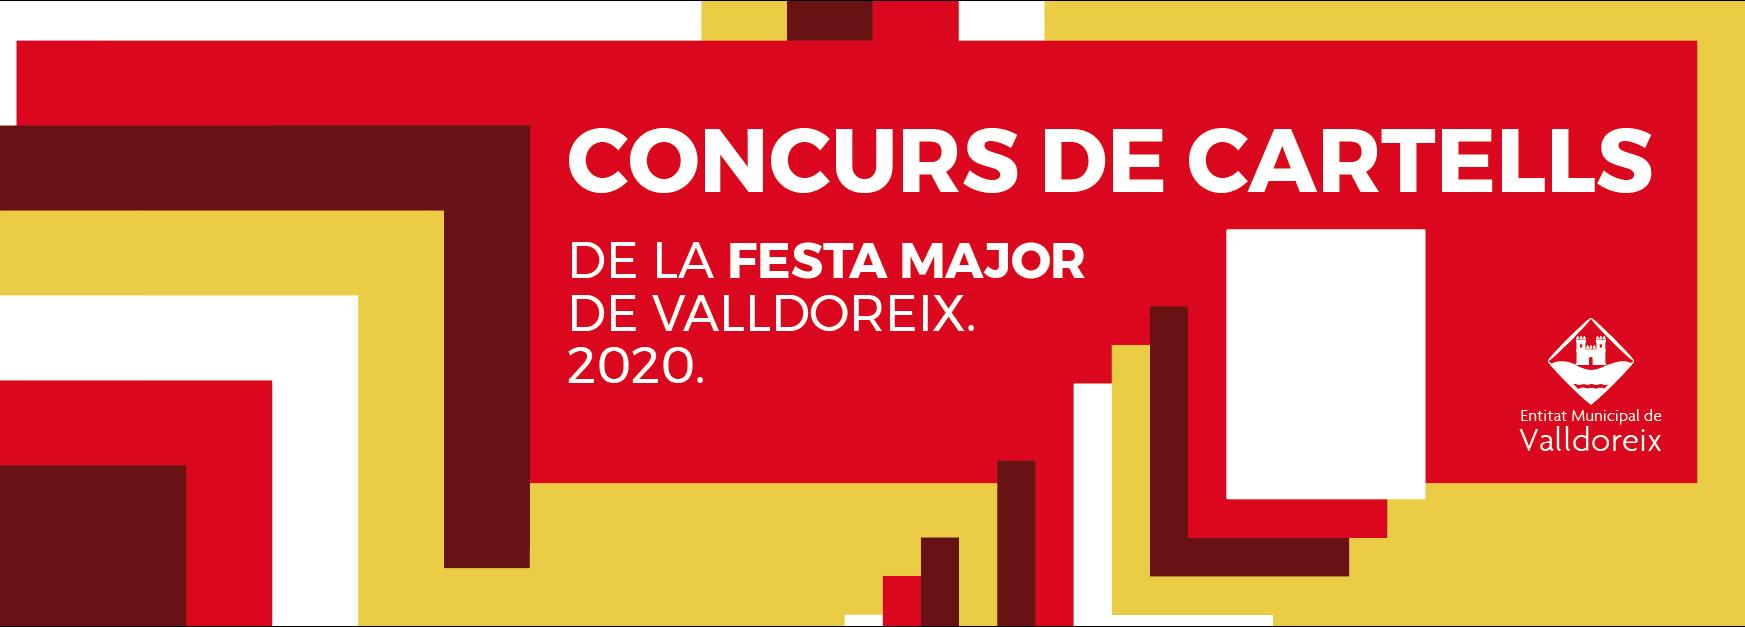 Valldoreix_bases_FM2020_Banner